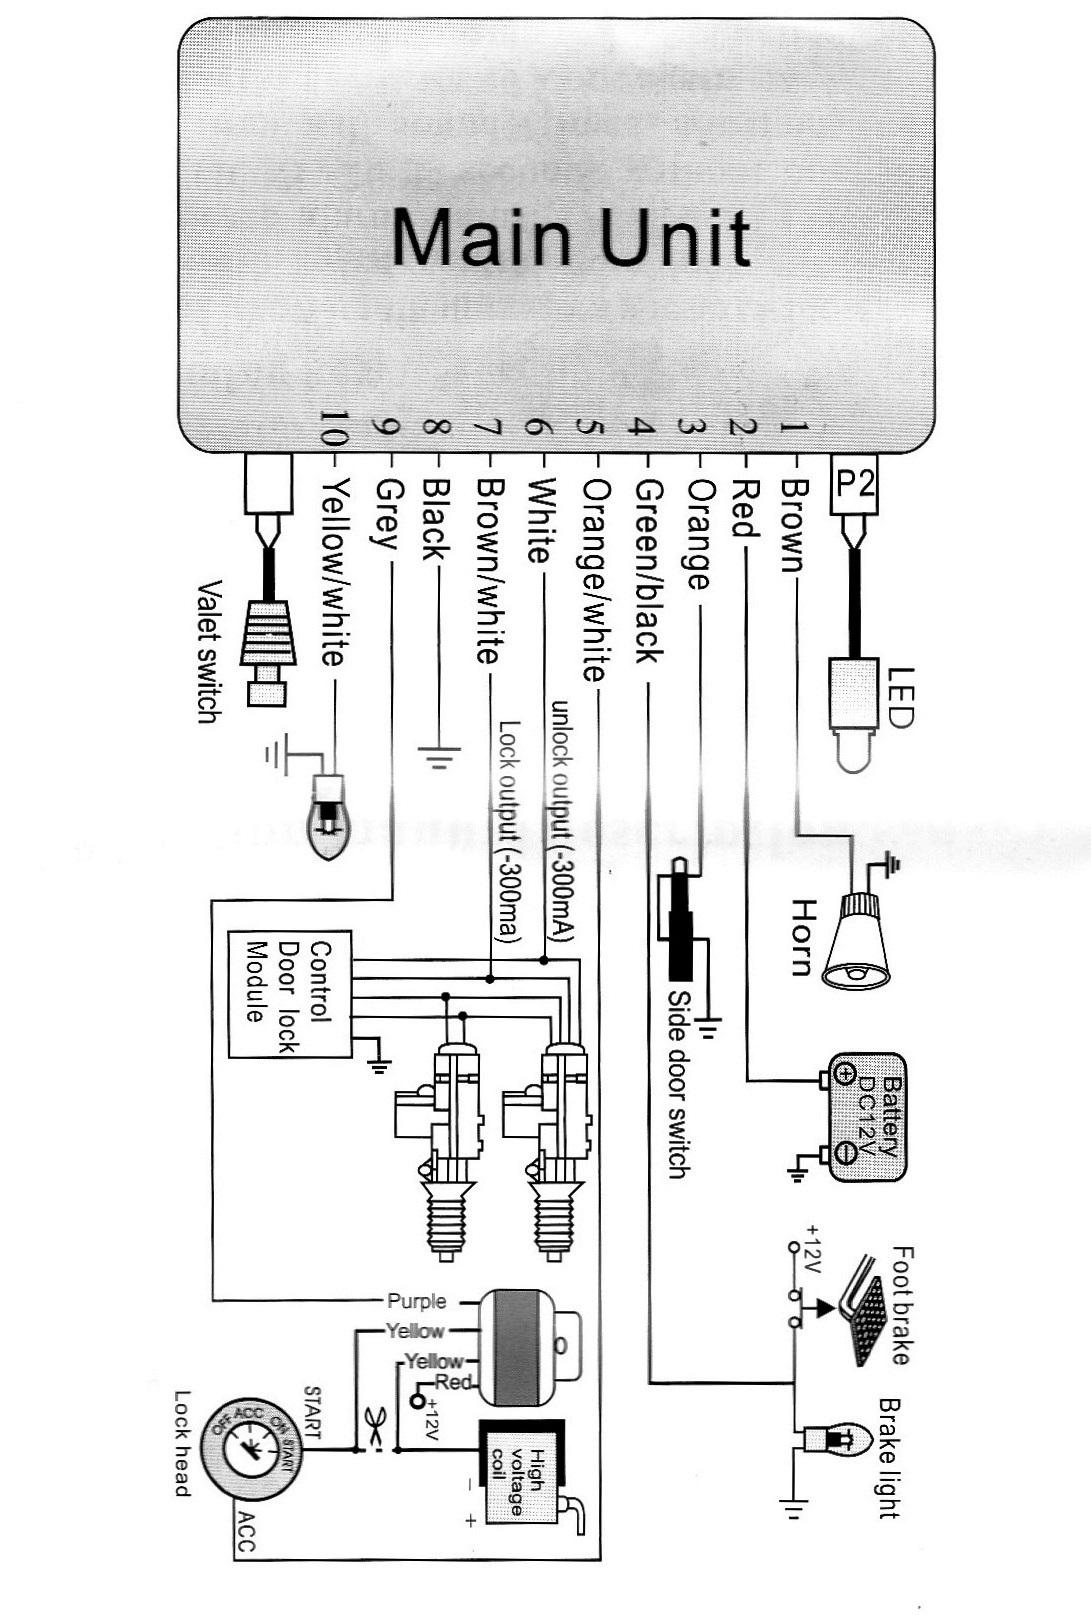 Wiring Diagram Alarm Kereta - Somurich.com on car alarm manual, car relay diagram, car electrical wiring, car schematic diagram, basic car alarm diagram, car thermostat diagram, car frame diagram, car alarm installation, car system diagram, elevator fire alarm system diagram, basic alarm system circuit diagram, car alarm relay, car engine diagram, car alarm system, viper 5904 installation diagram, car stereo diagram, vehicle alarm system diagram, car alarm lights, car audio diagram, car alarm repair,